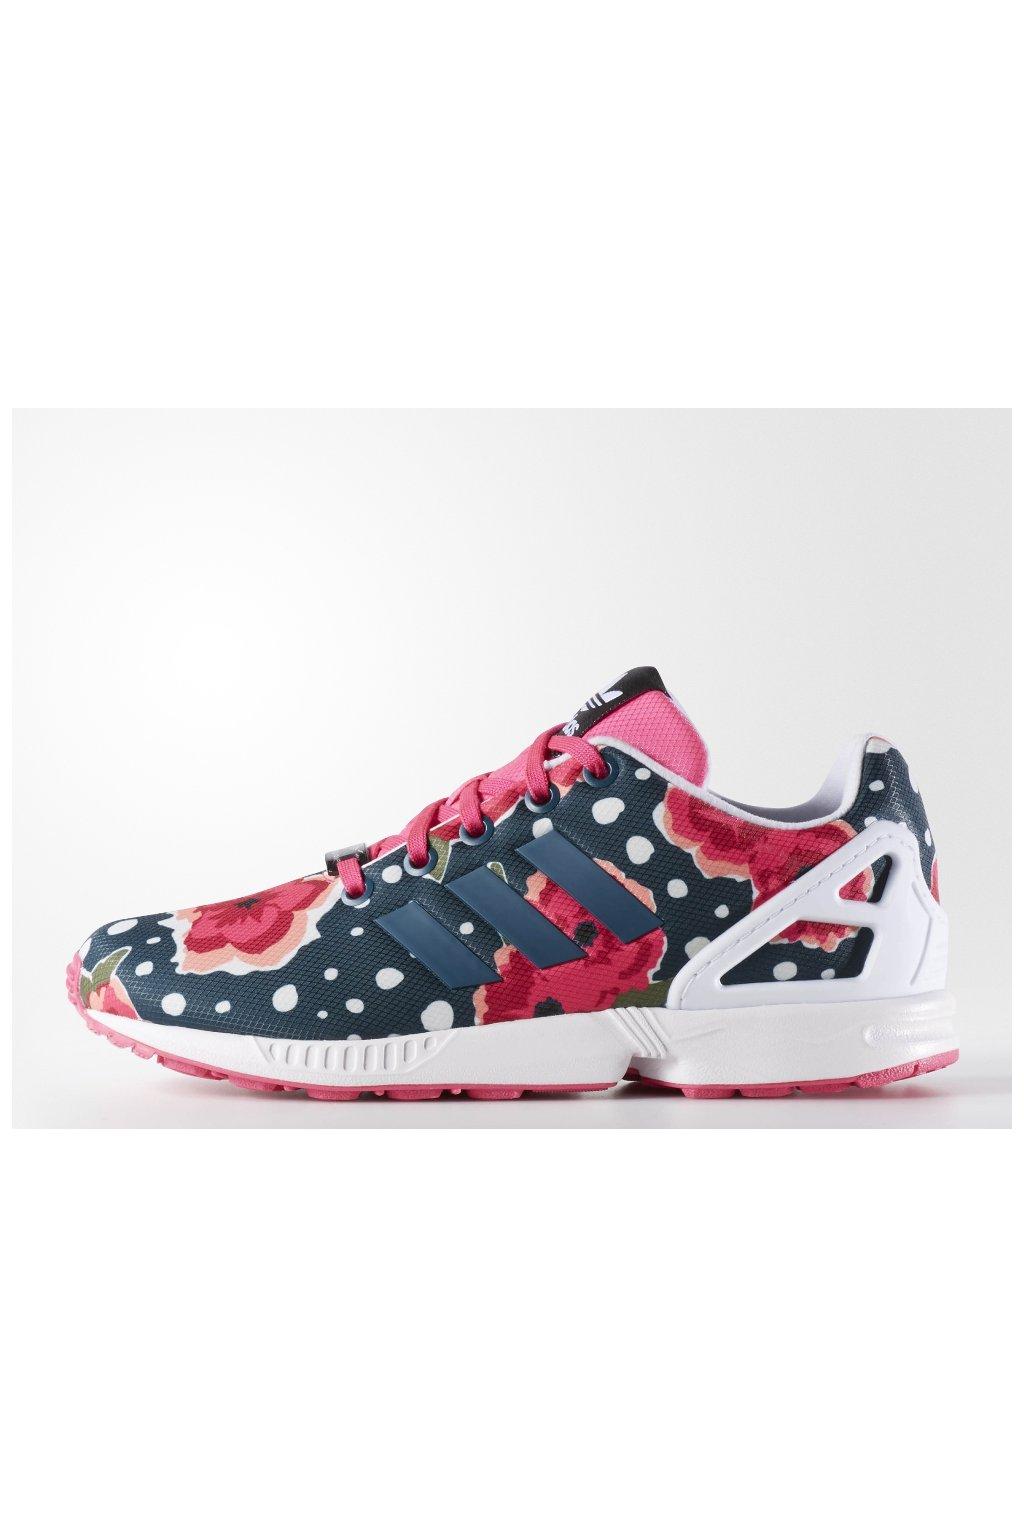 S76290 tenisky adidas zx flux f